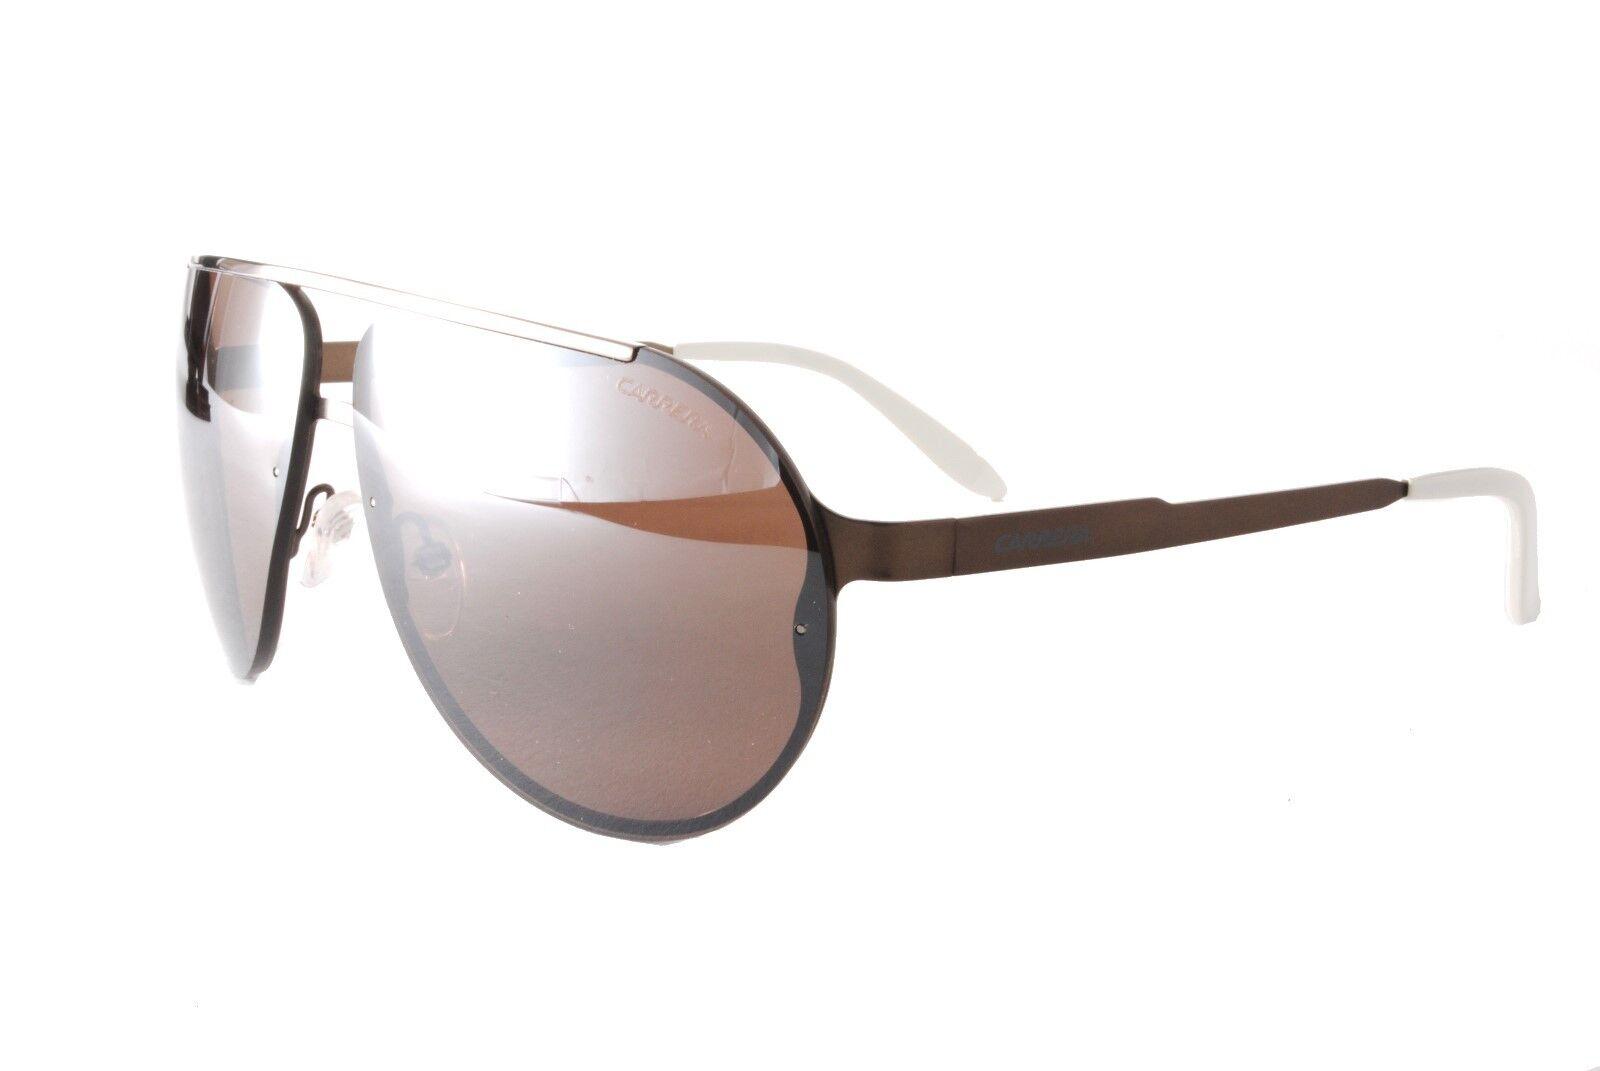 cd0733ef07 Carrera Sunglasses Carrera 90S J8P8G Matt Brown Silver Brown